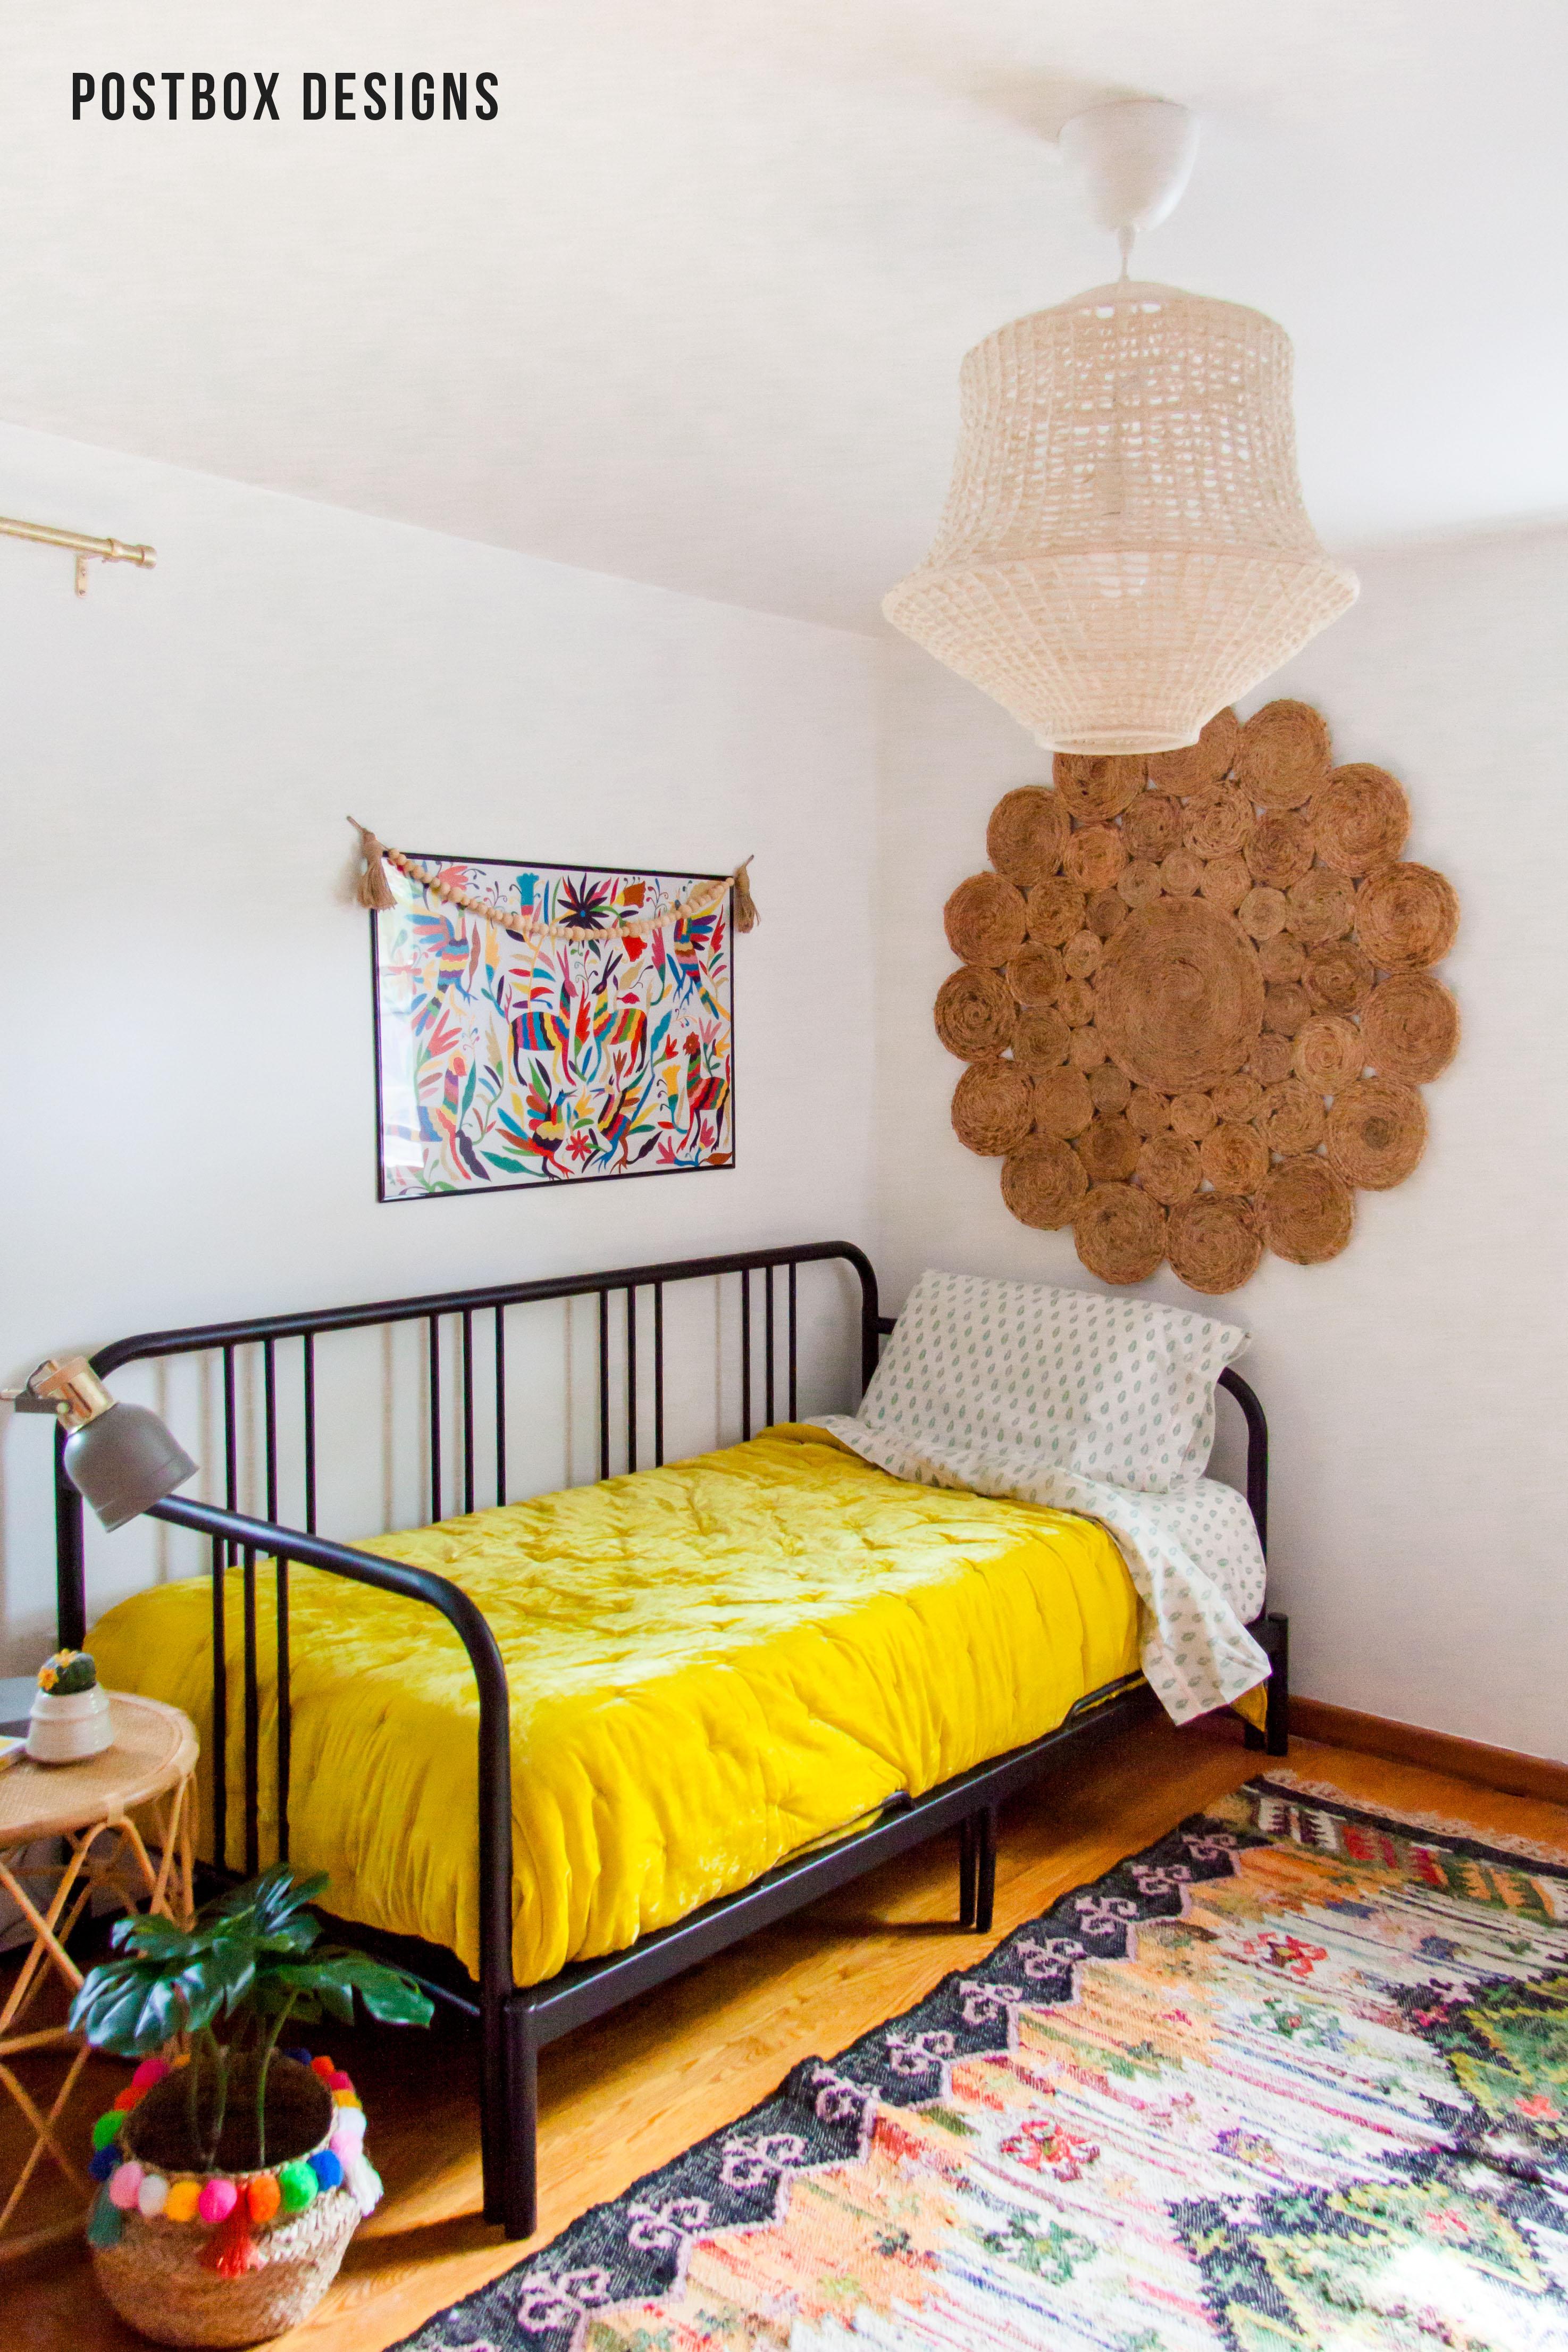 Interior Design Of Guest Room: Boho-home-office-postbox-designs-online-interior=design